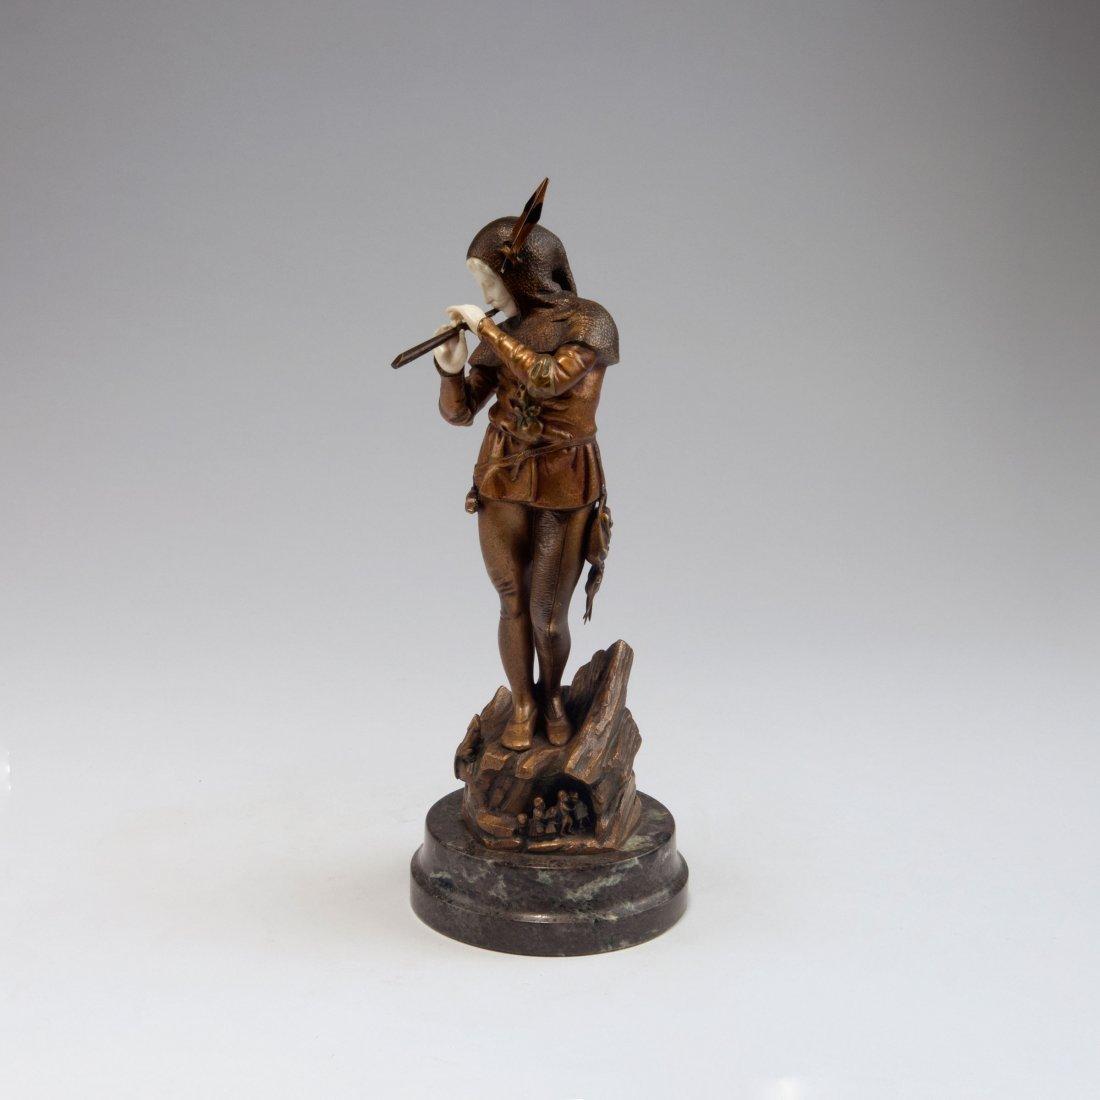 'Pied Piper of Hamelin', c1890